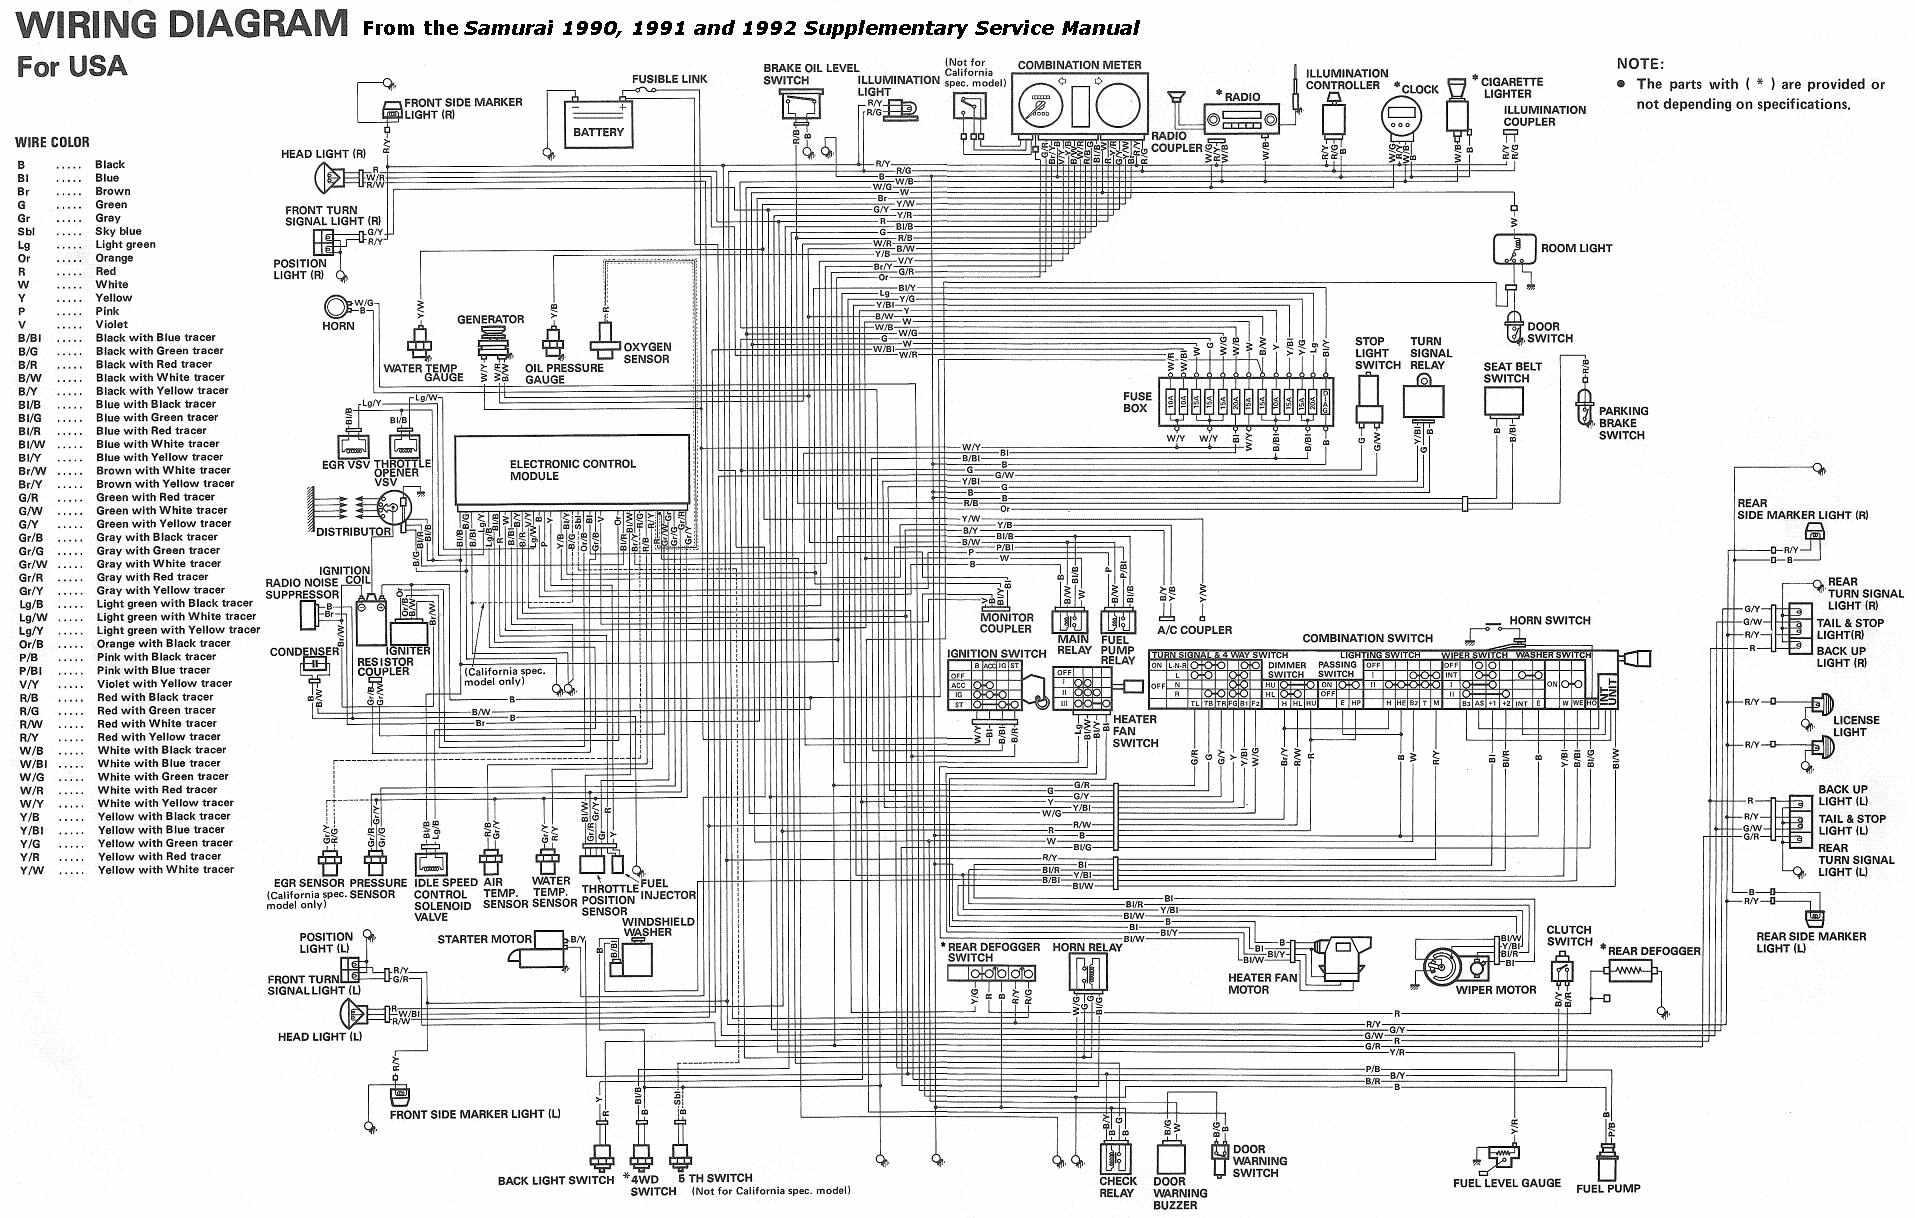 87 toyota pickup wiring diagram facbooik com 1983 Toyota Pickup Wiring Diagram 87 toyota pickup wiring diagram facbooik 1983 toyota pickup wiring diagram